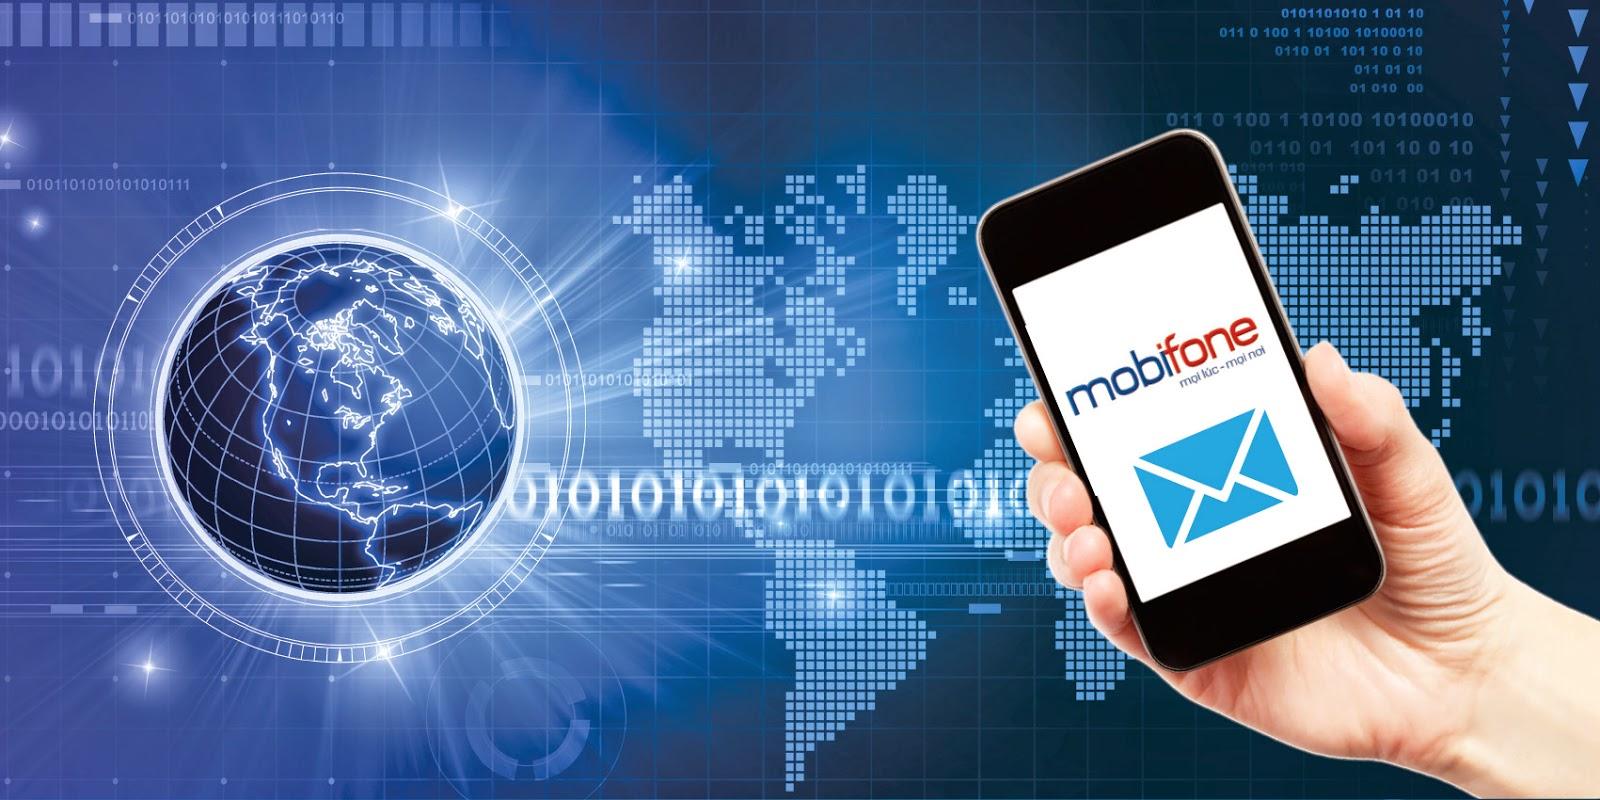 Số trung tâm tin nhắn của Vinaphone, Mobiphone, Viettel, Vietnammobile